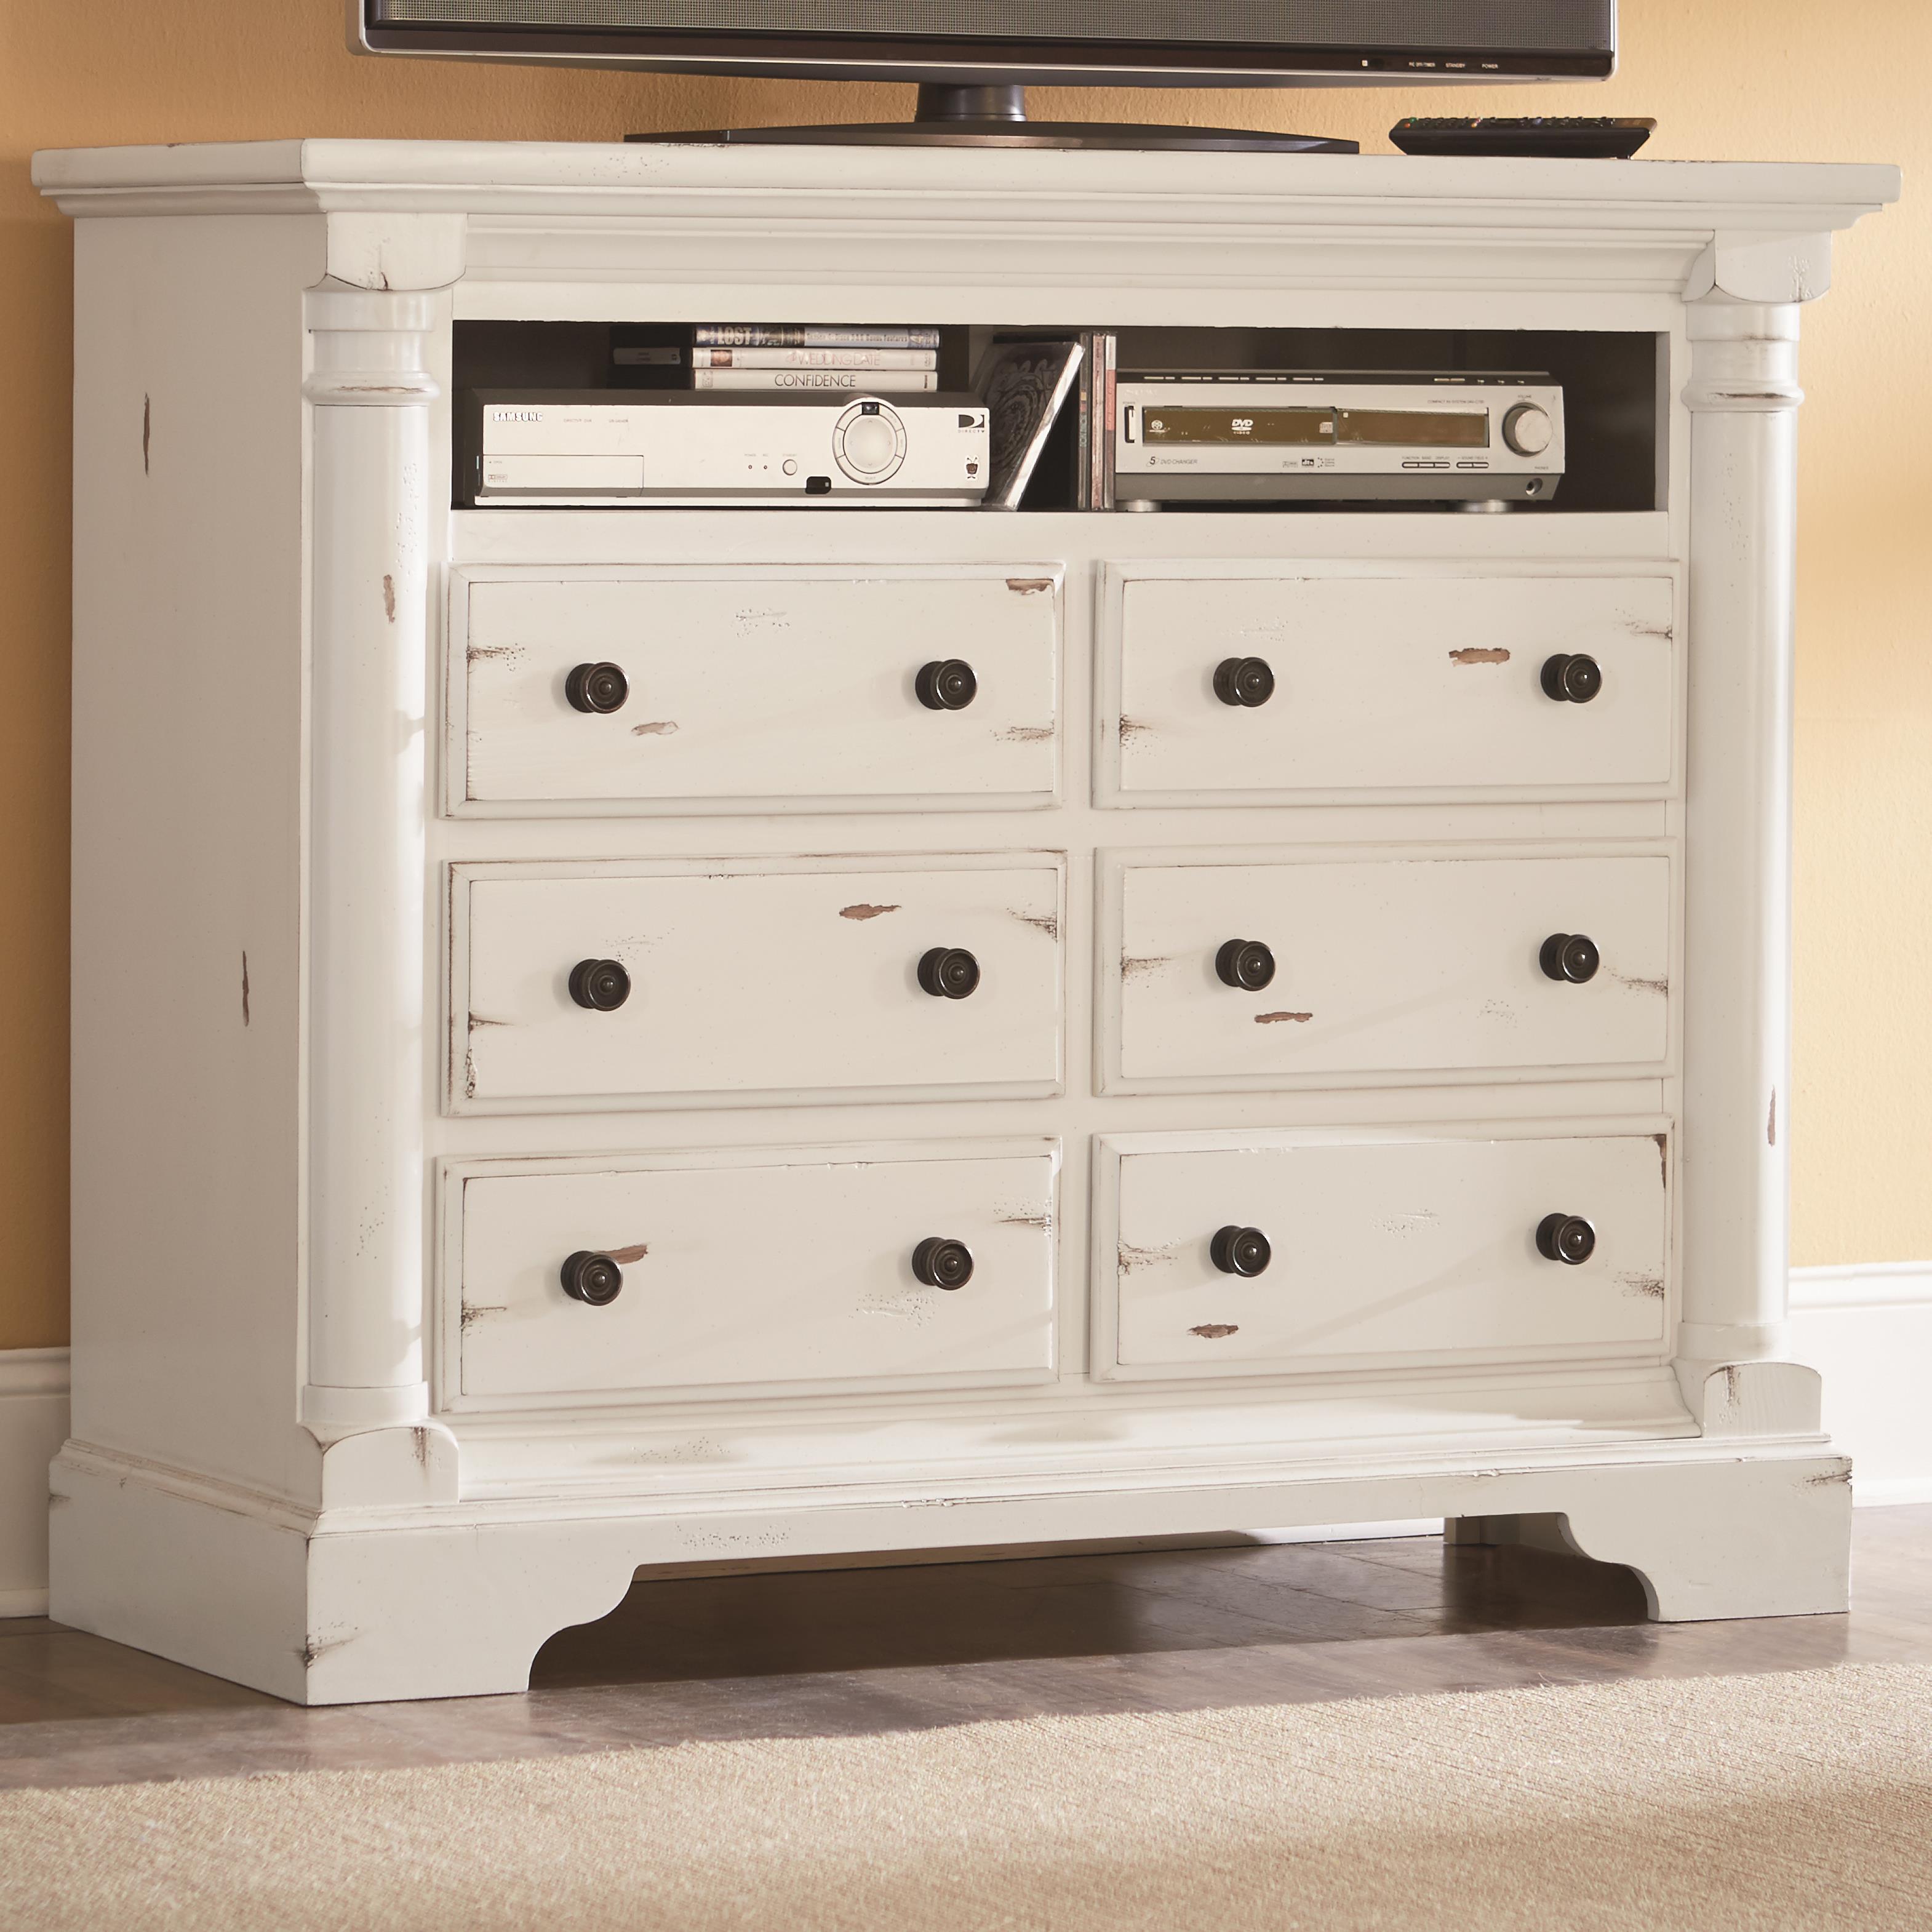 Progressive Furniture Gramercy Park Media Chest - Item Number: P661-46